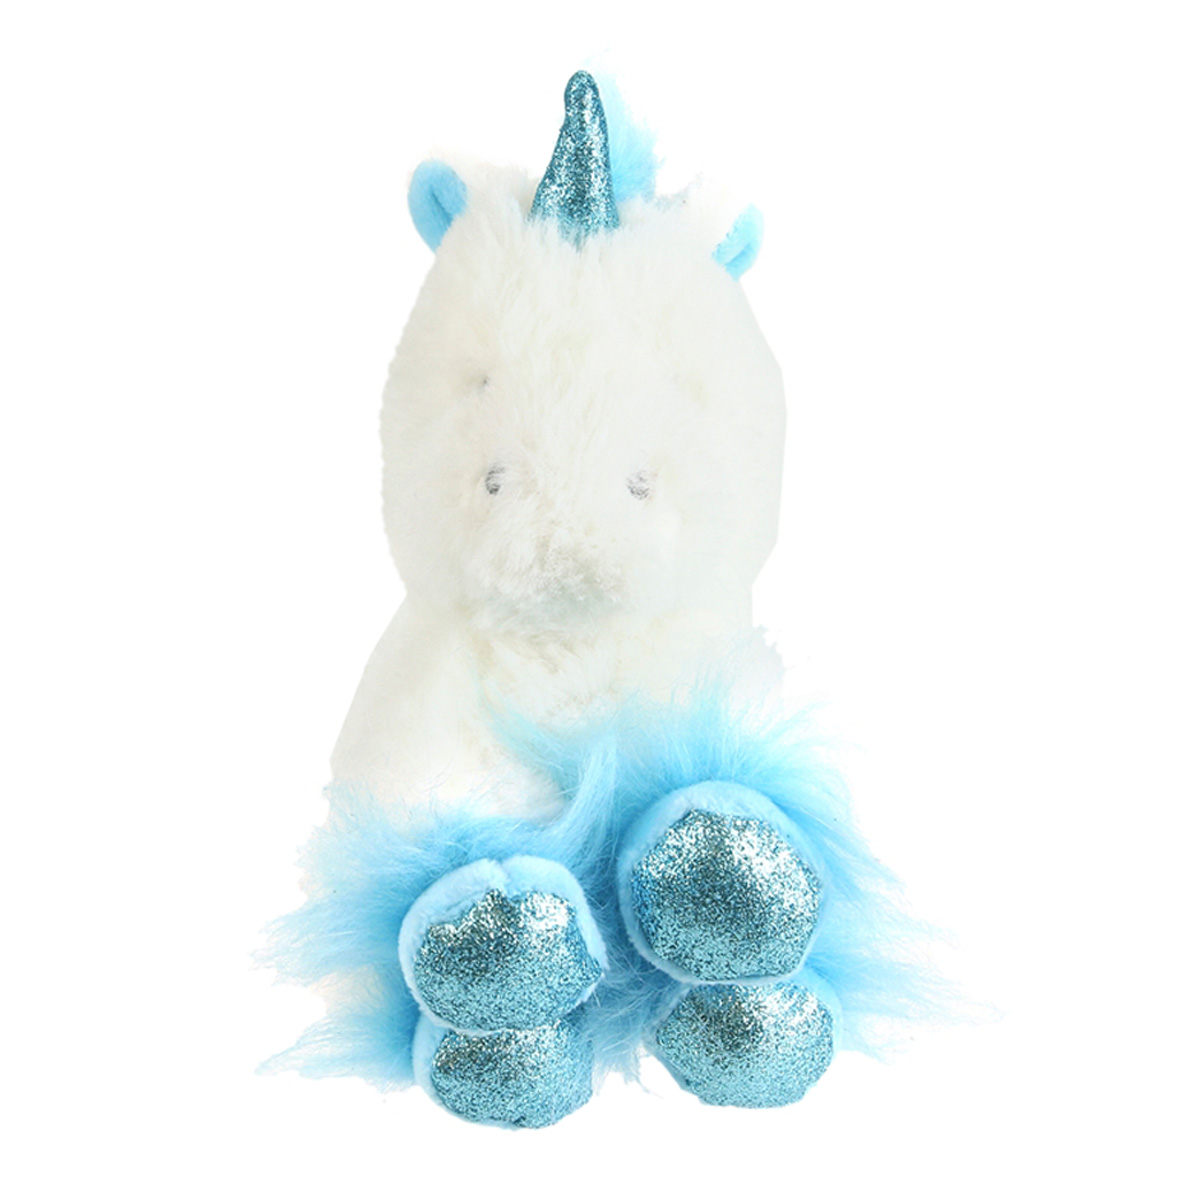 Peluche design \'Licorne My Unicorn\' bleu blanc - 15 cm - [Q4439]